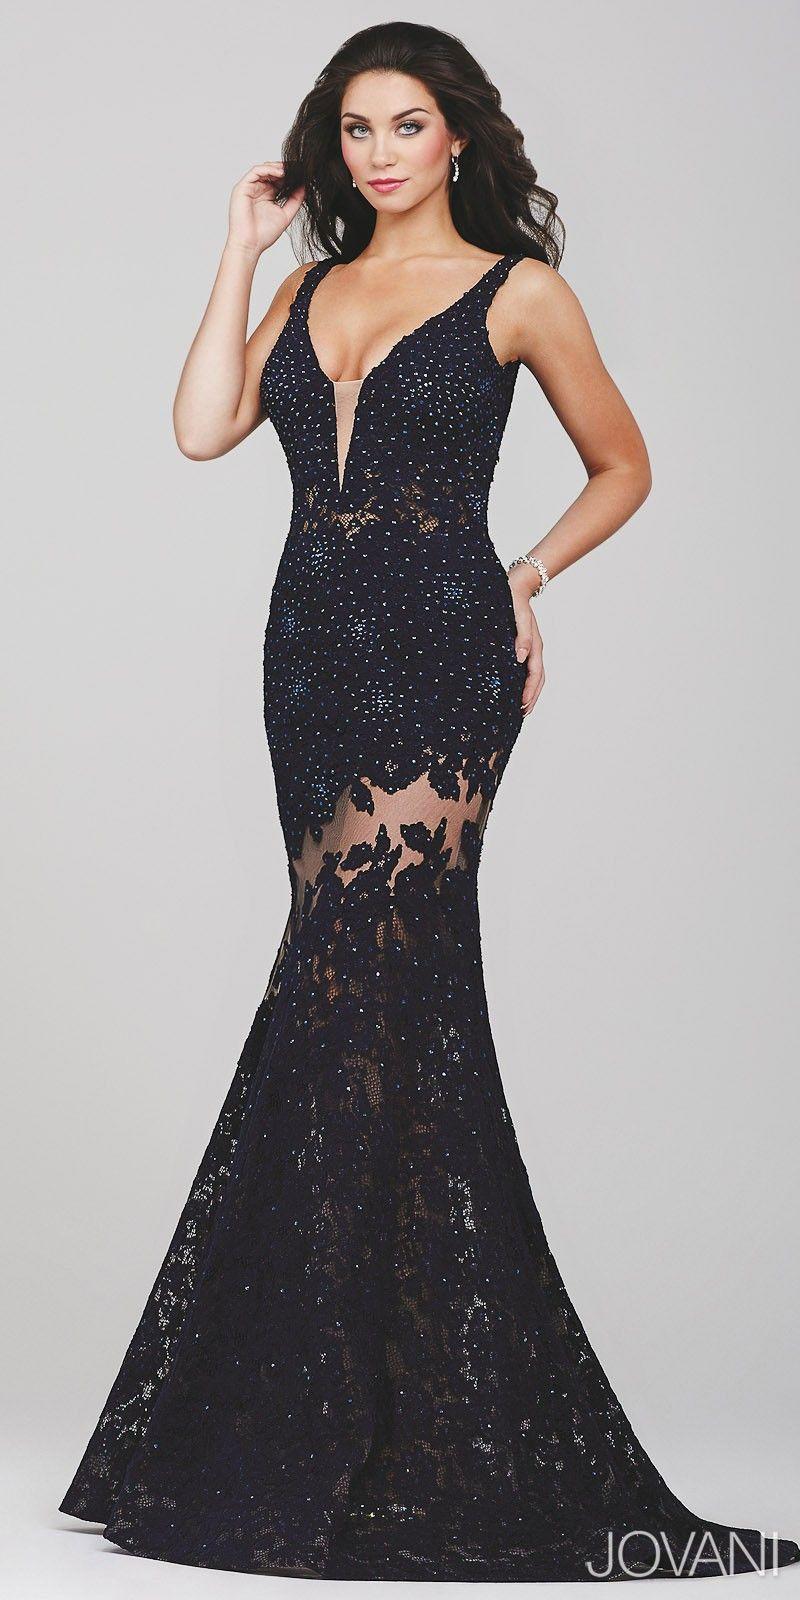 Sparkle lace illusion prom dress by jovani womenus fashion